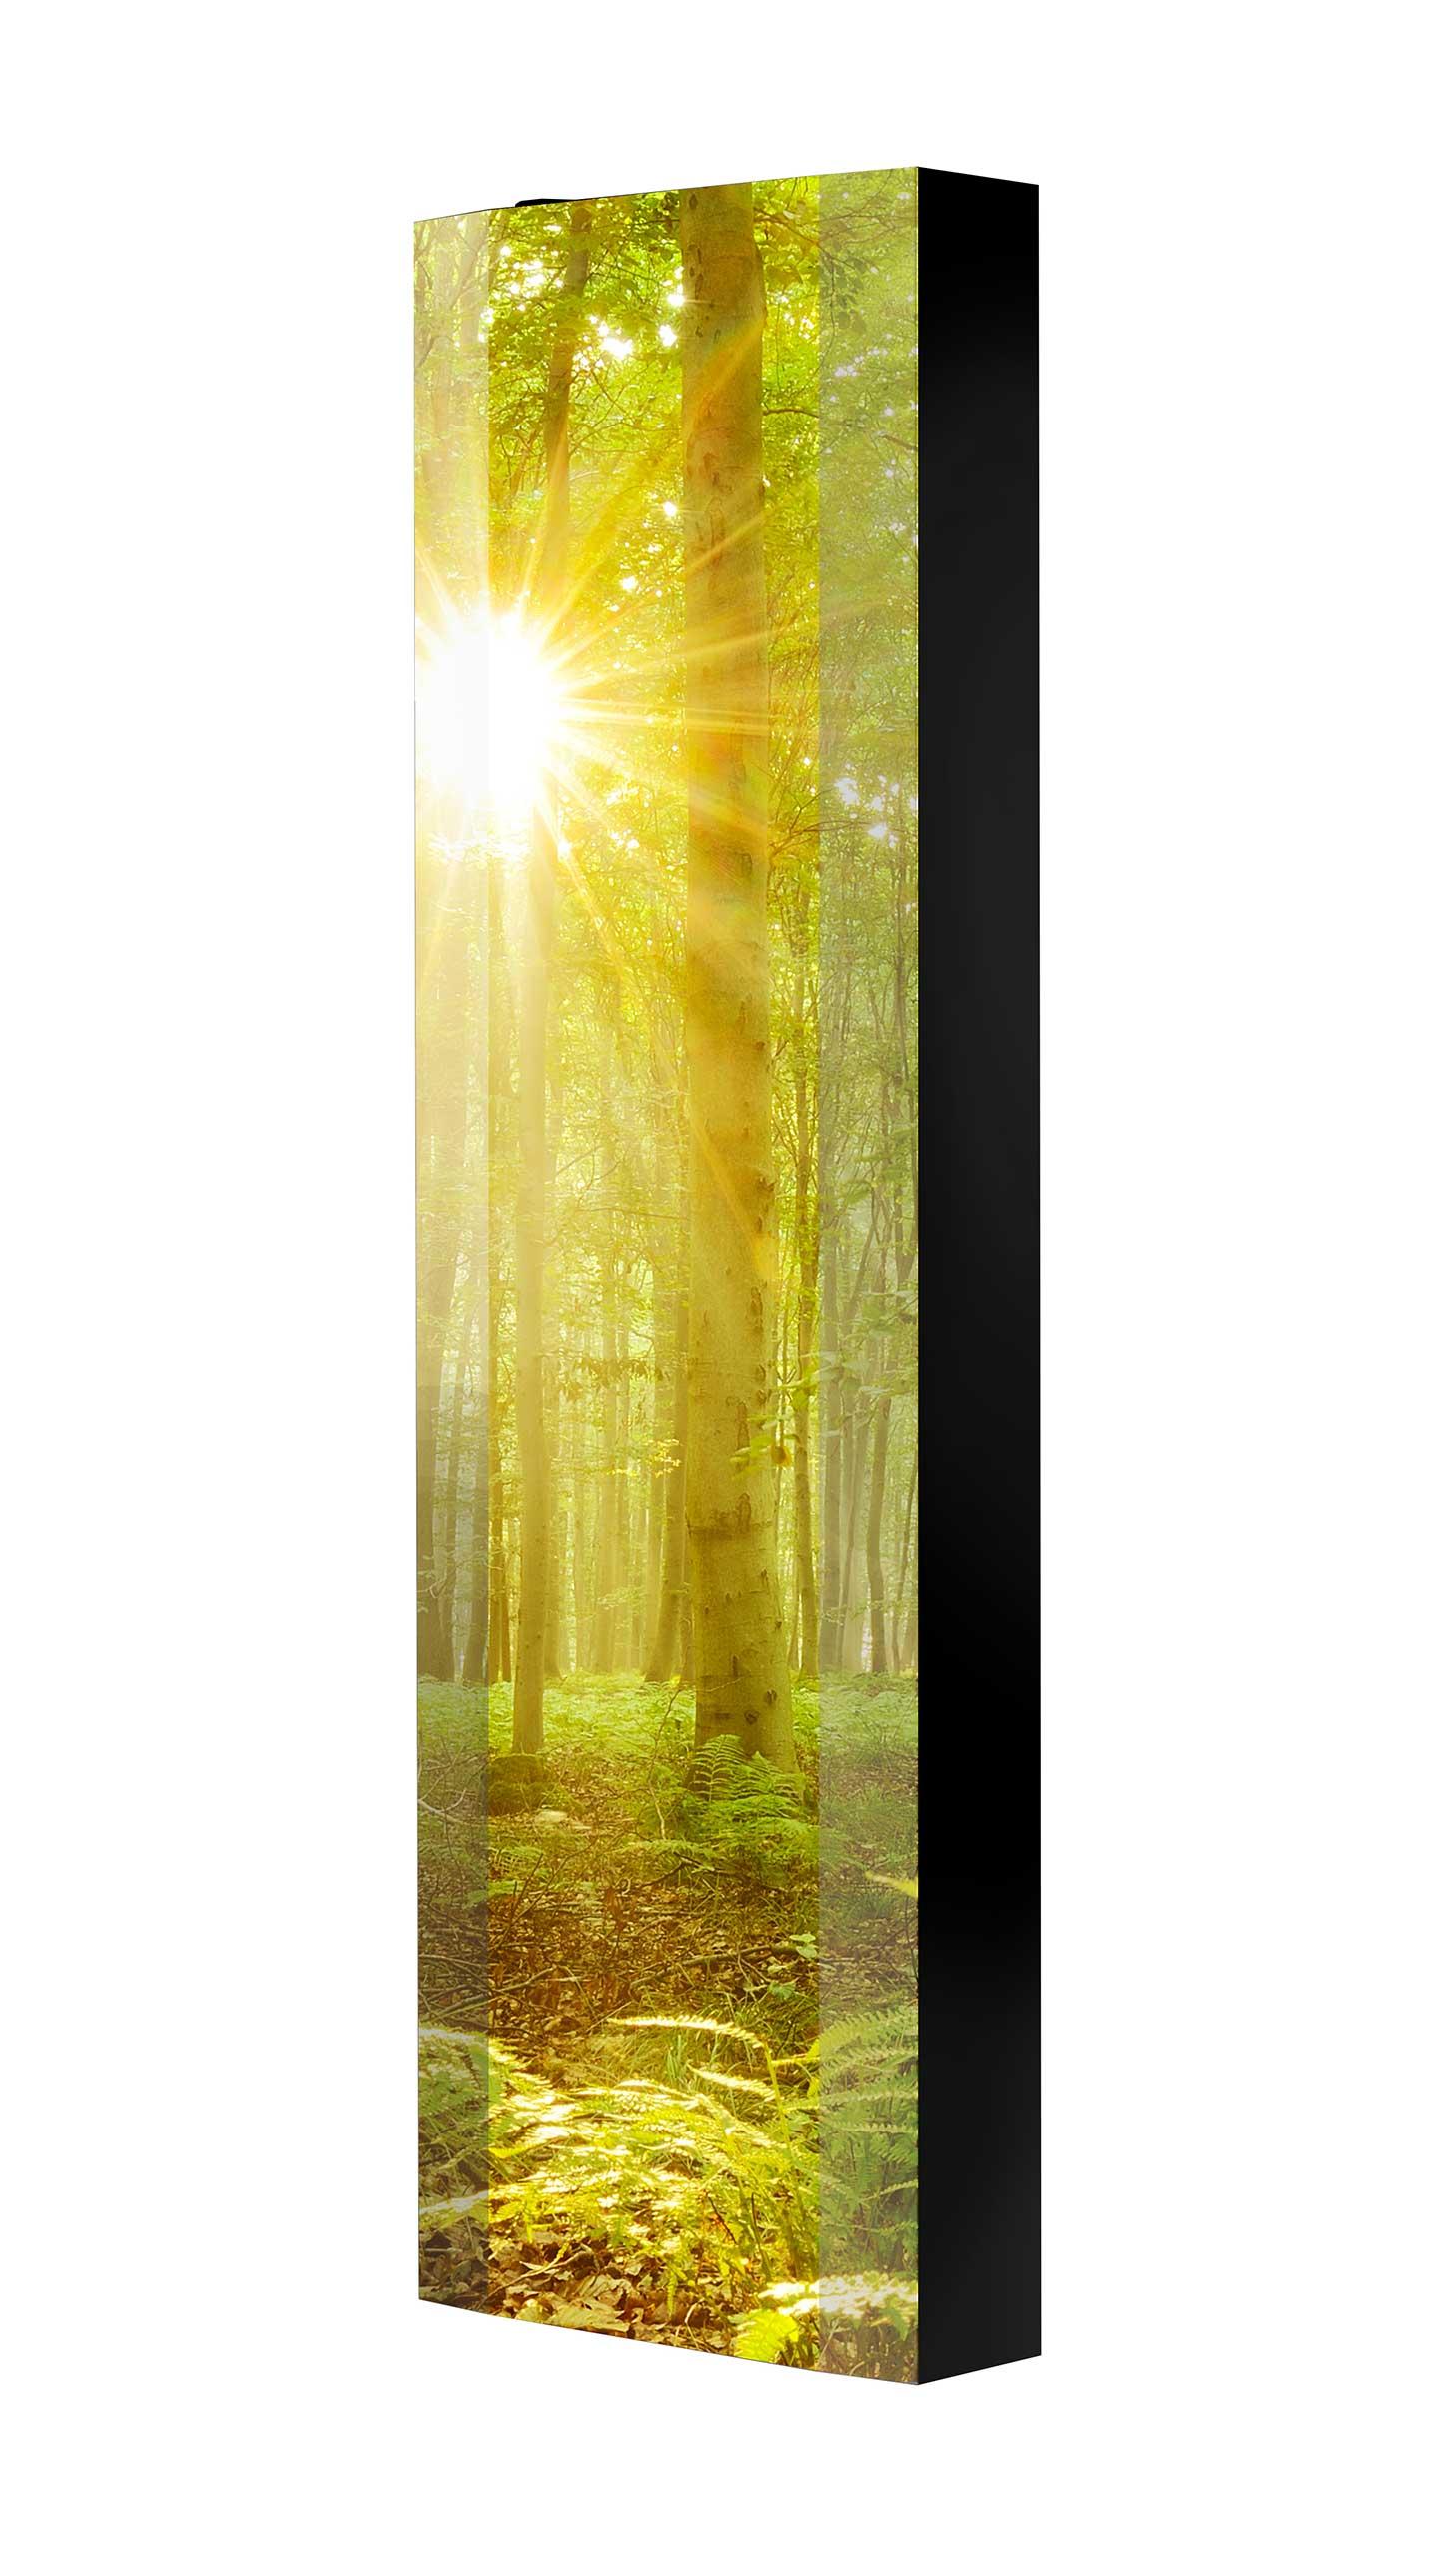 Schuhschrank FLASH 450 BLACK-EDITION Motivschrank schwarz drehbar M112 Wald Bäume